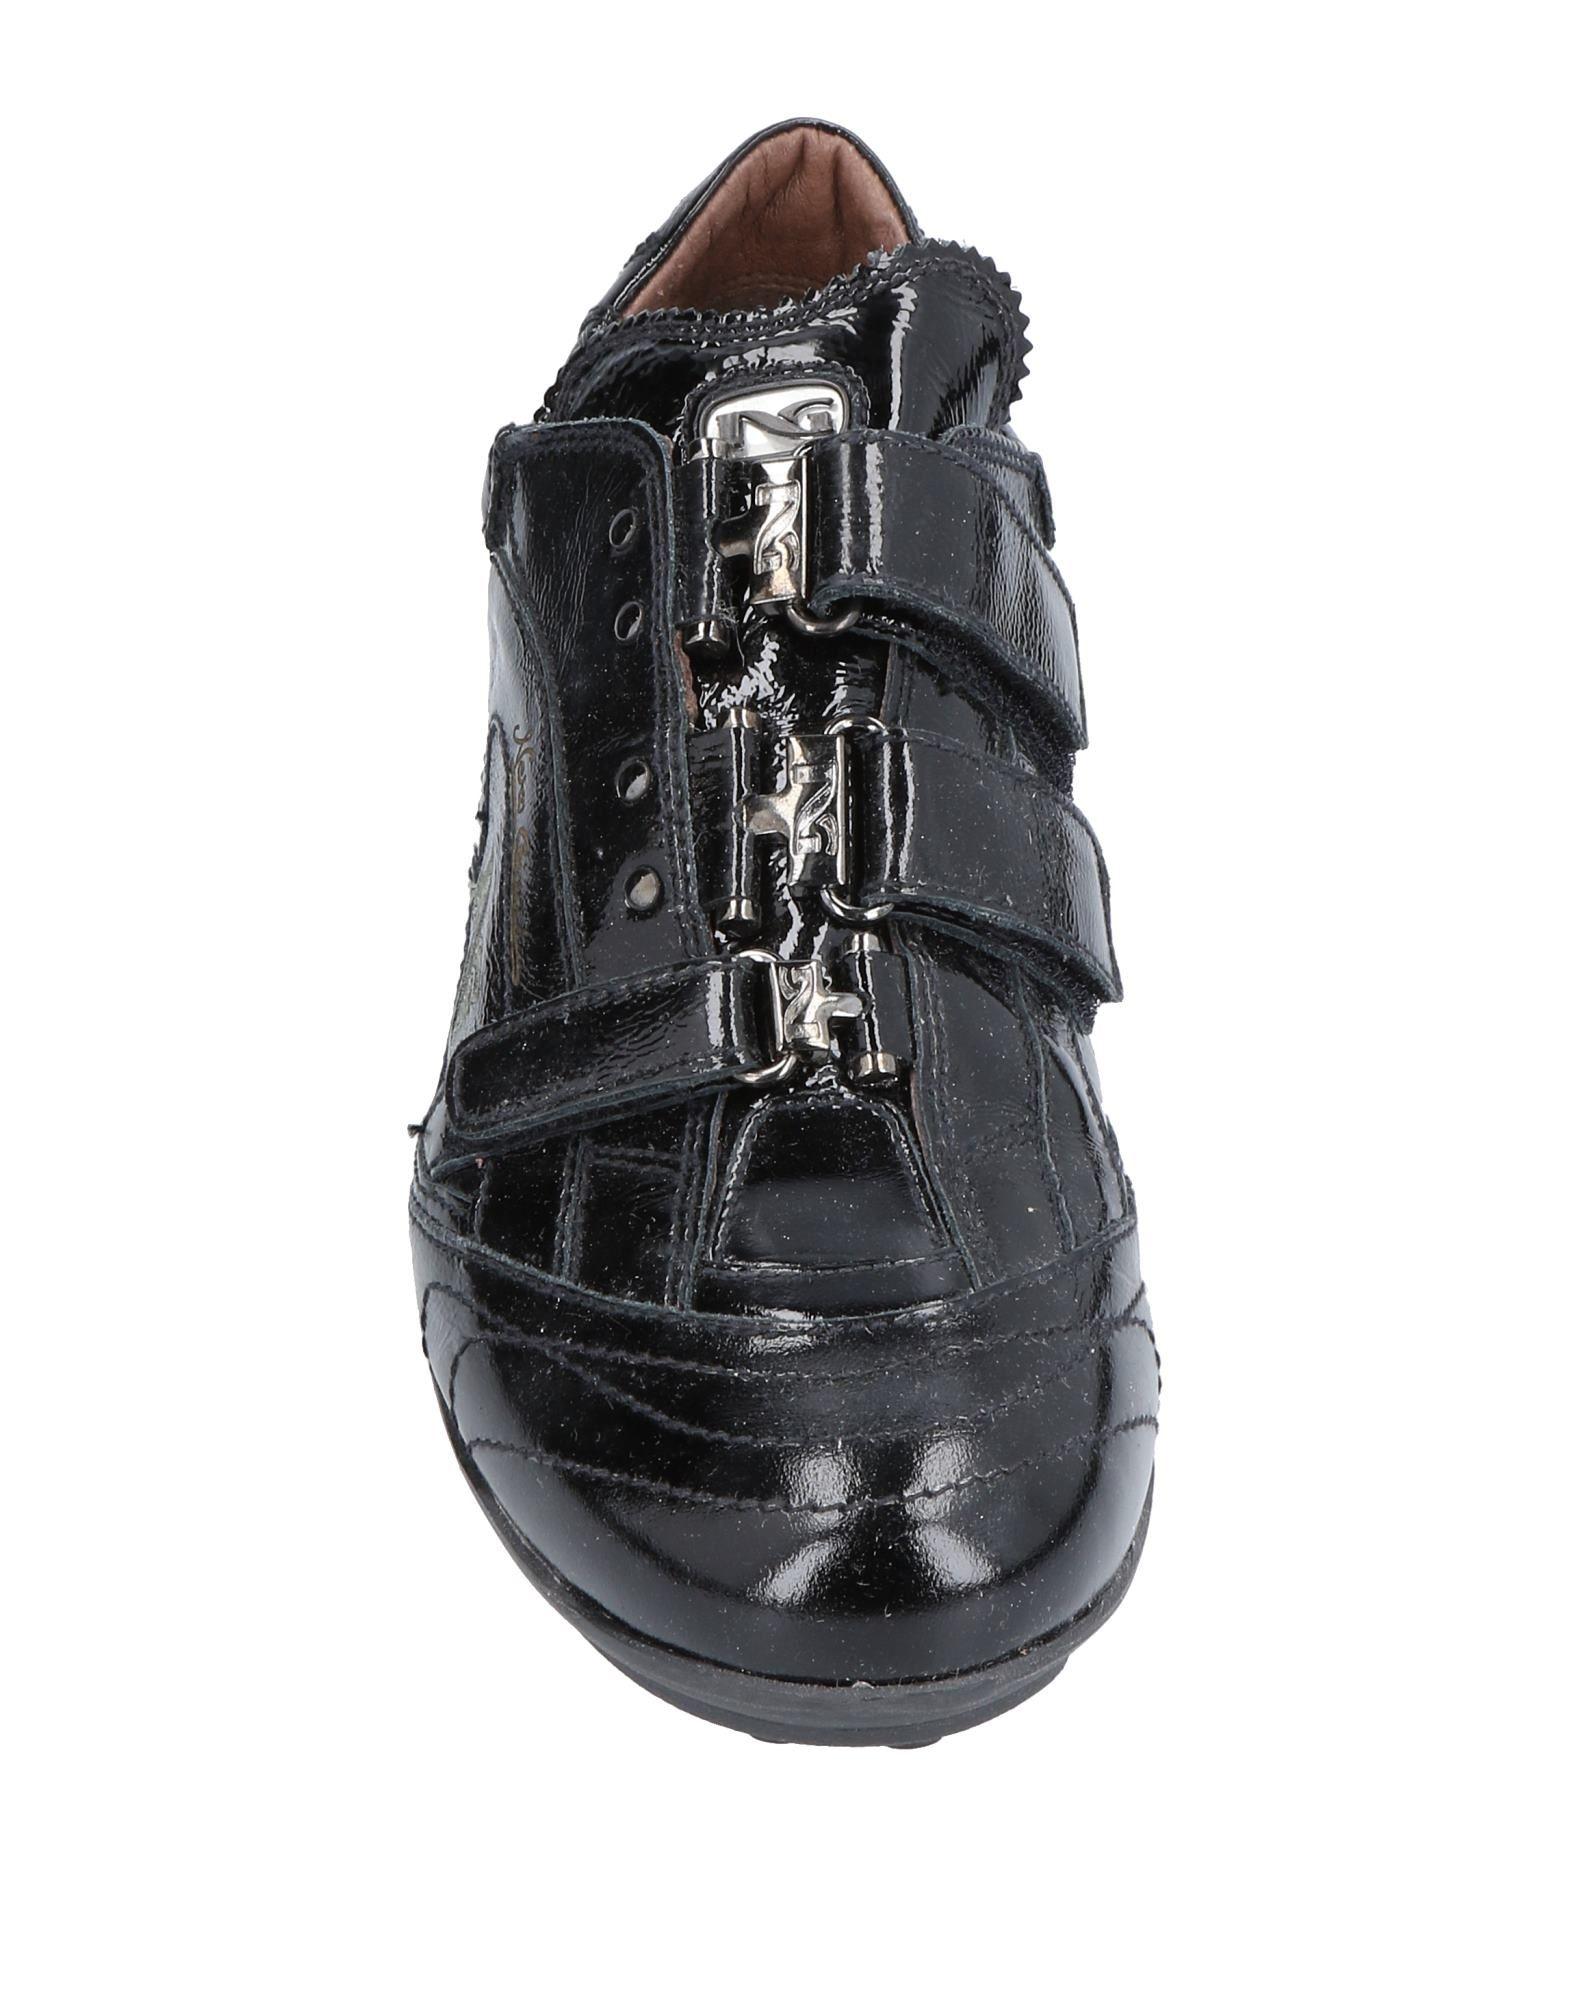 Rabatt echte Schuhe Ng Nero Giardini Sneakers Herren  11499839EO